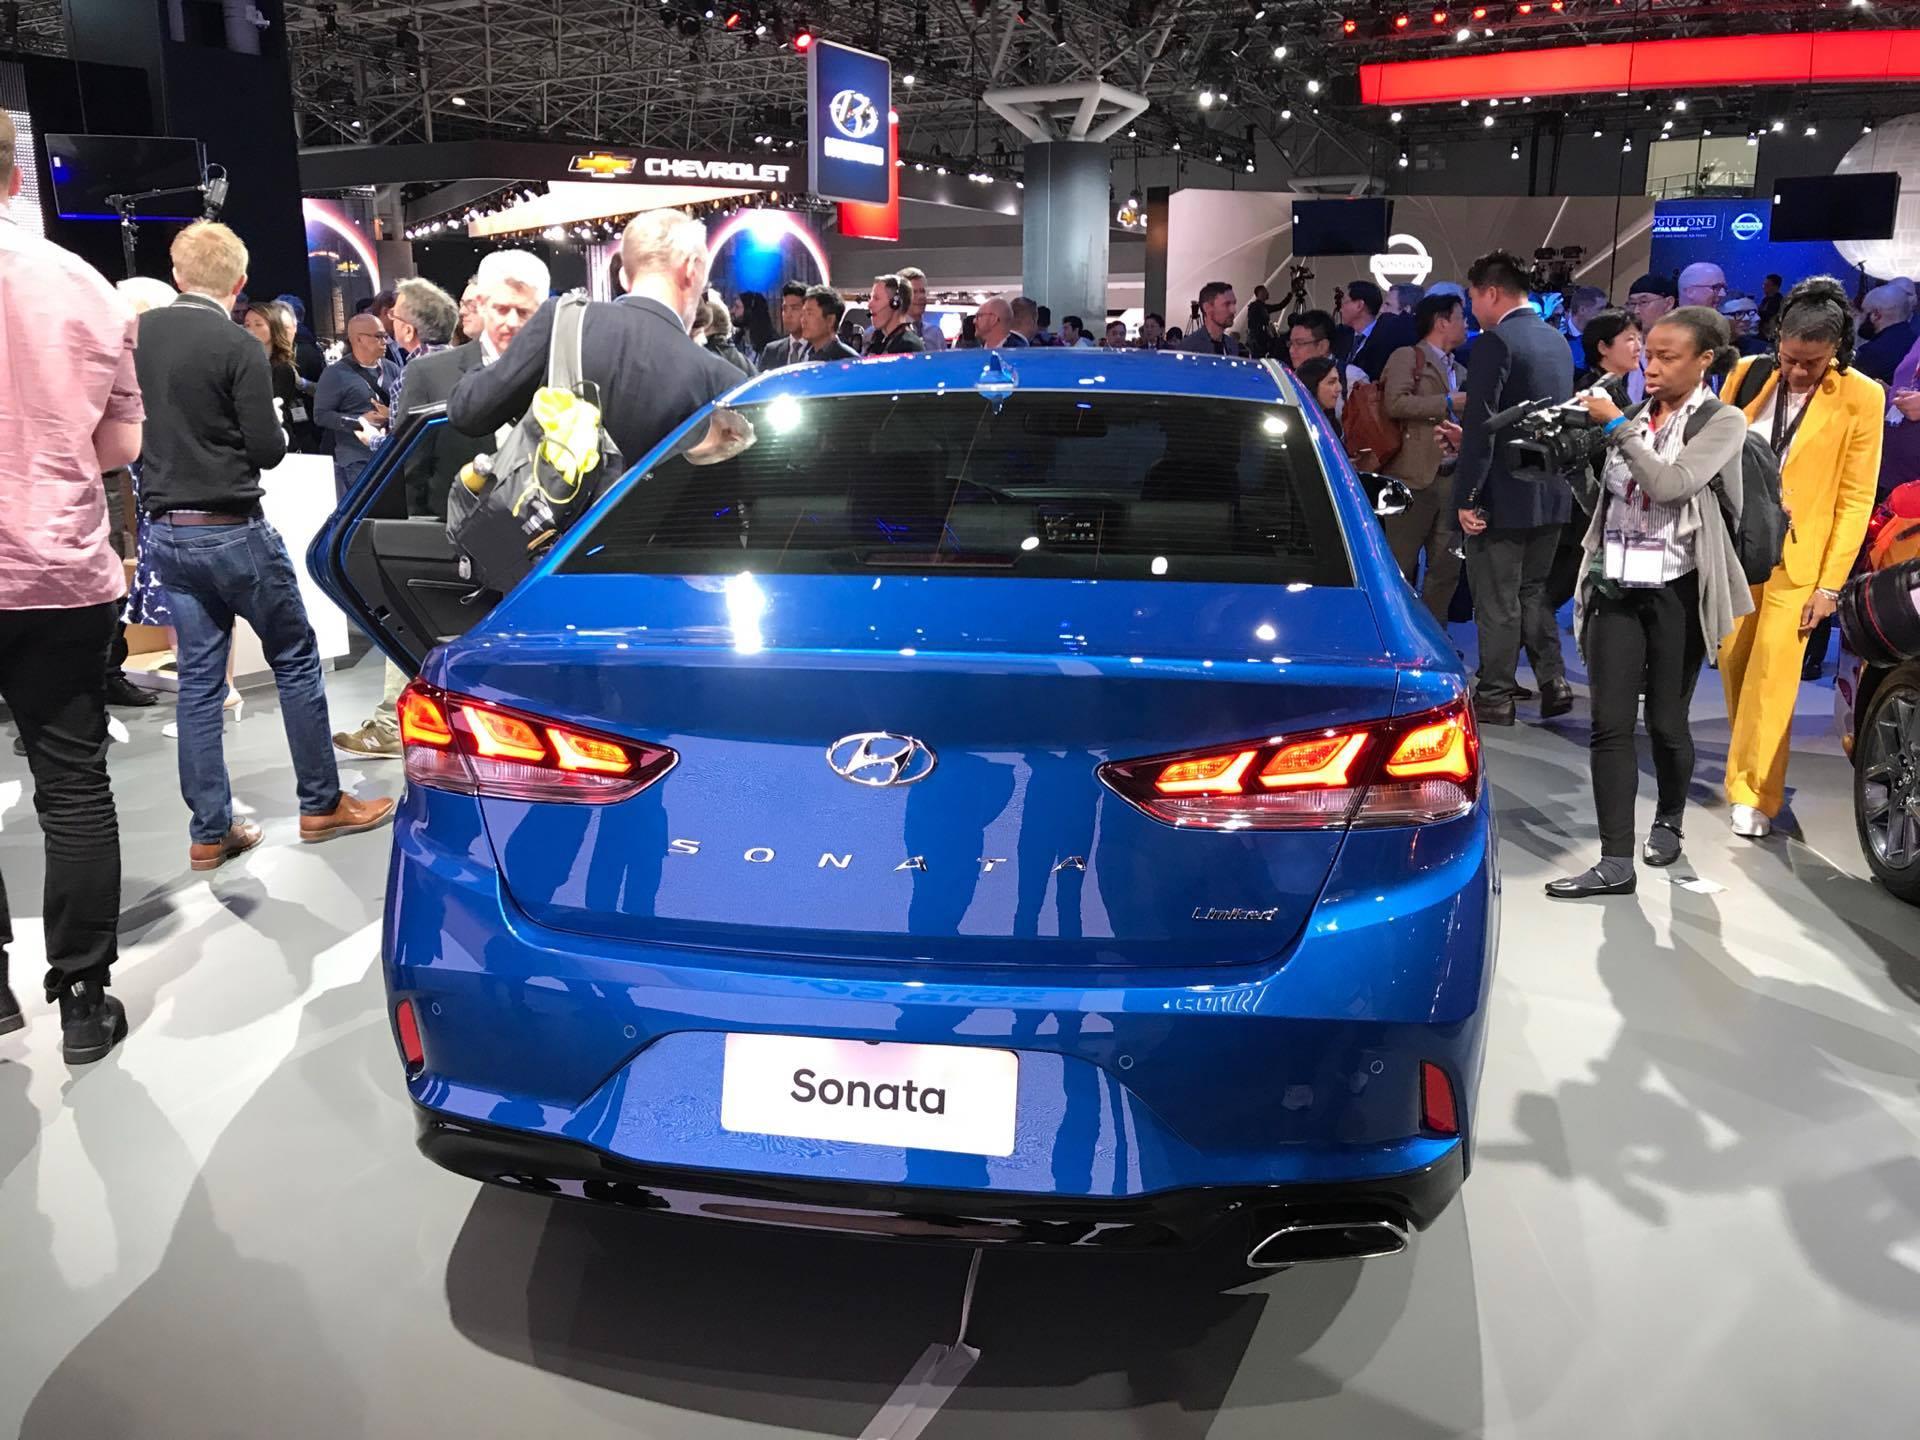 2018 hyundai new car. plain car 2018 hyundai sonata sedan car reveal at 2017 new york international auto  show model redesign presentation limited trim trunk  the news wheel in hyundai new